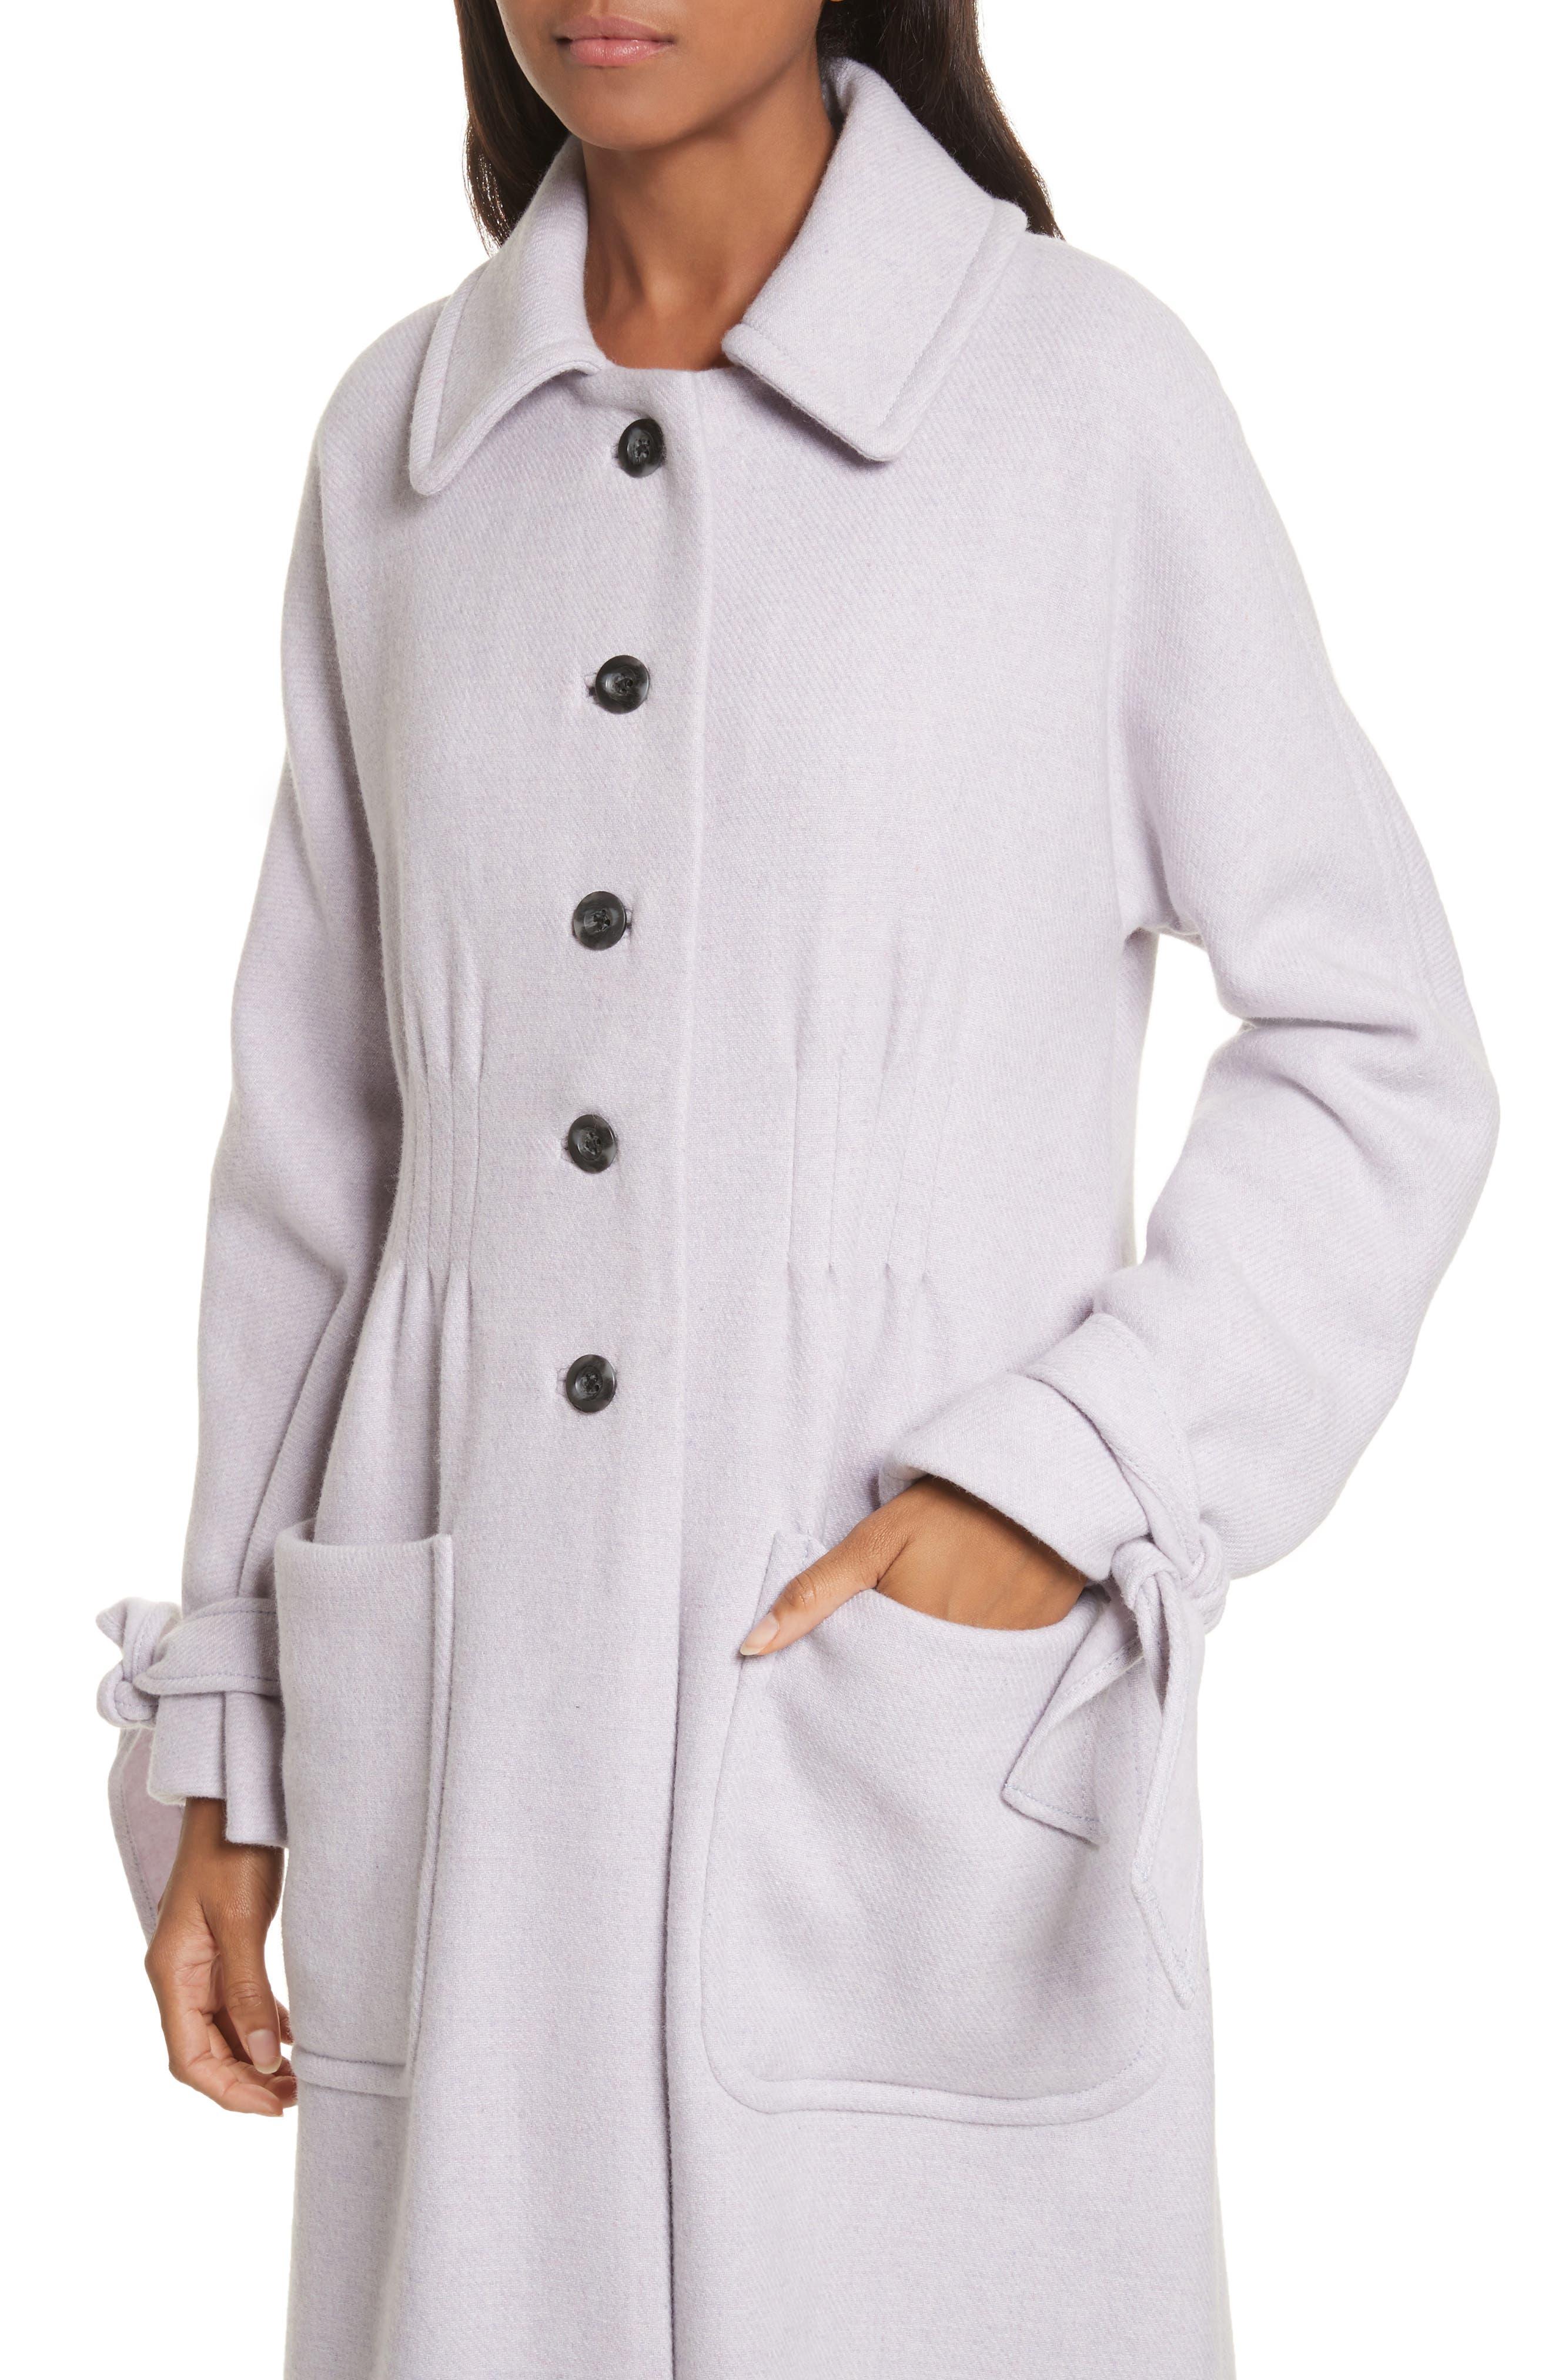 Wool Blend Melton Coat,                             Alternate thumbnail 4, color,                             Dusty Lavender